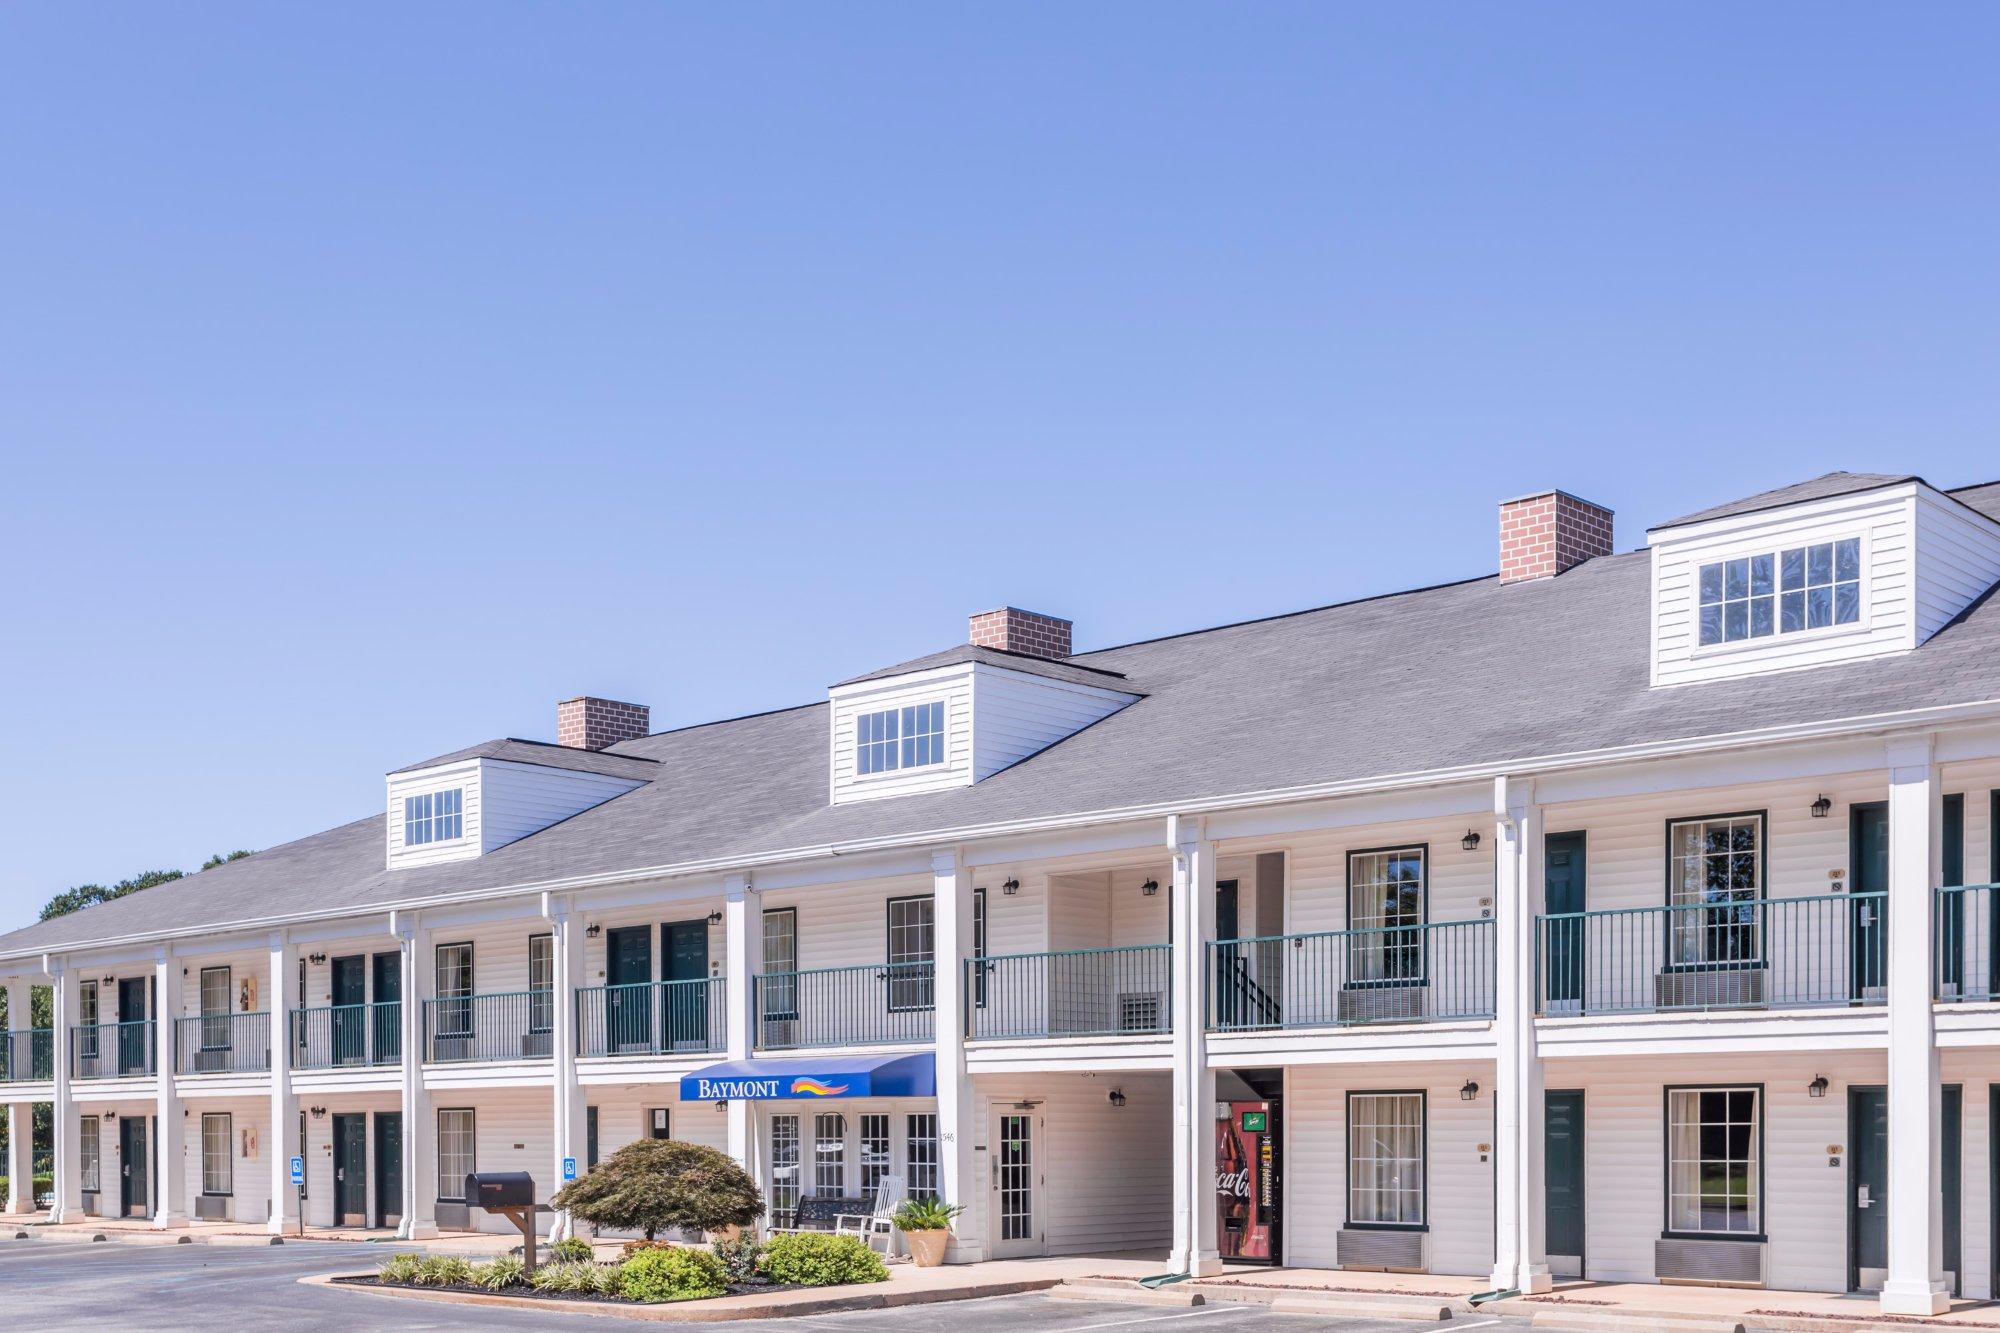 Baymont Inn & Suites Duncan/Spartanburg